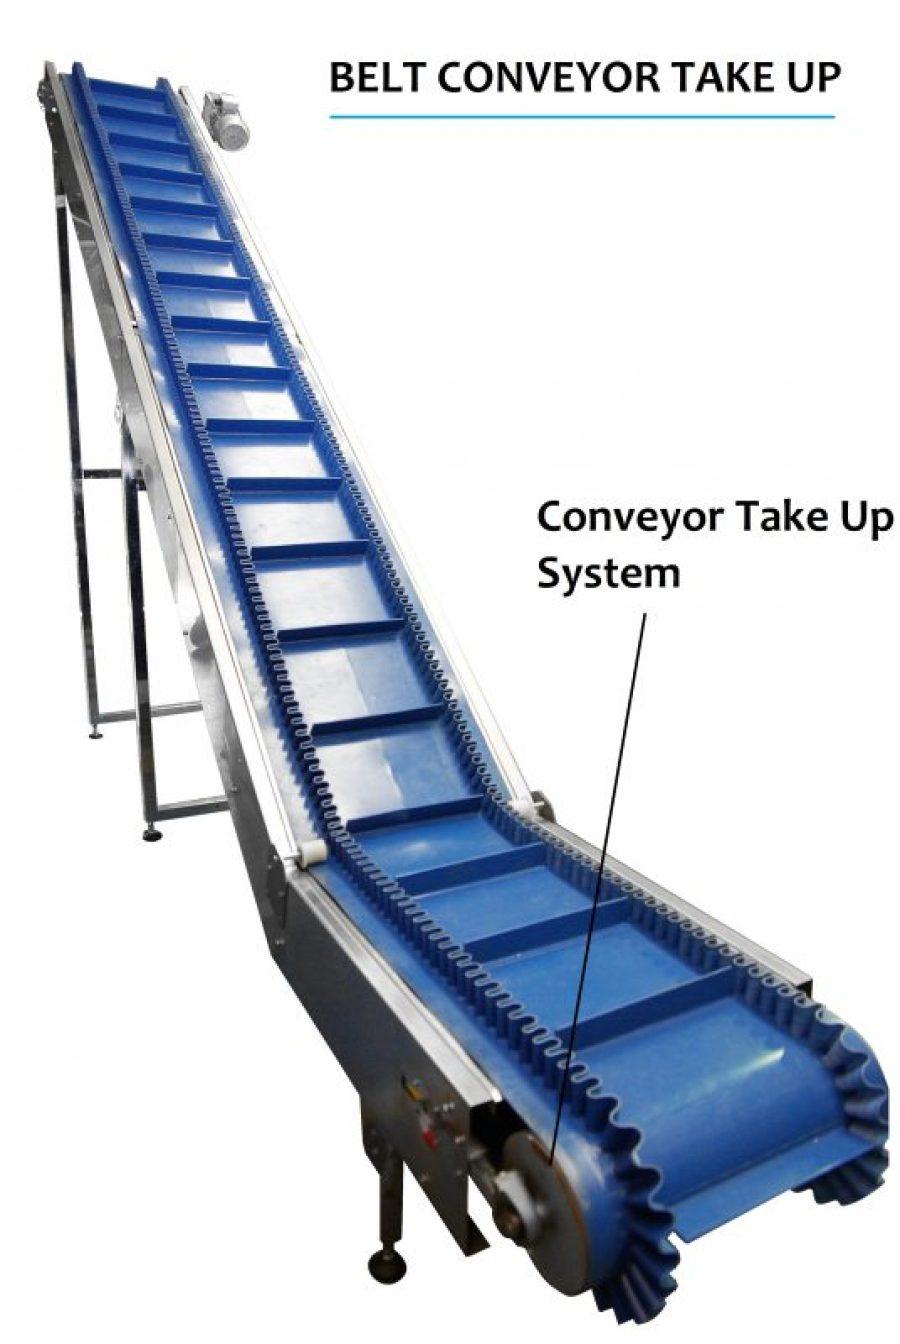 01-Conveyor-Take-Up-Adjustment-To-Tension-The-Belt